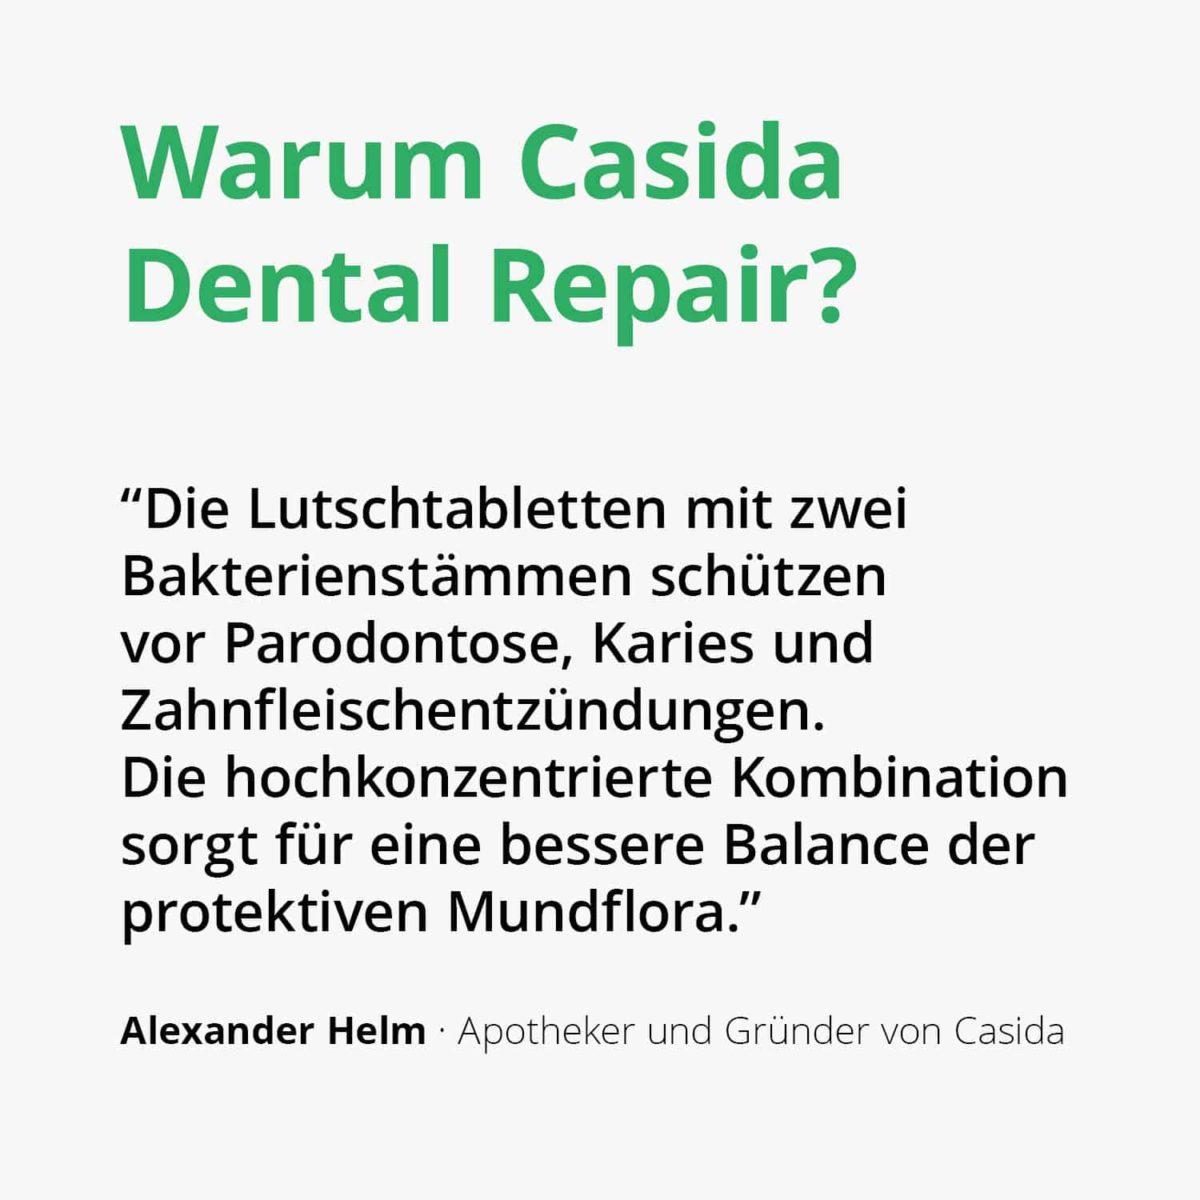 Casida Dental Repair Lutschtabletten – 60 Stk. 14401553 PZN Apotheke Karies Zahnpflege Parodontose2